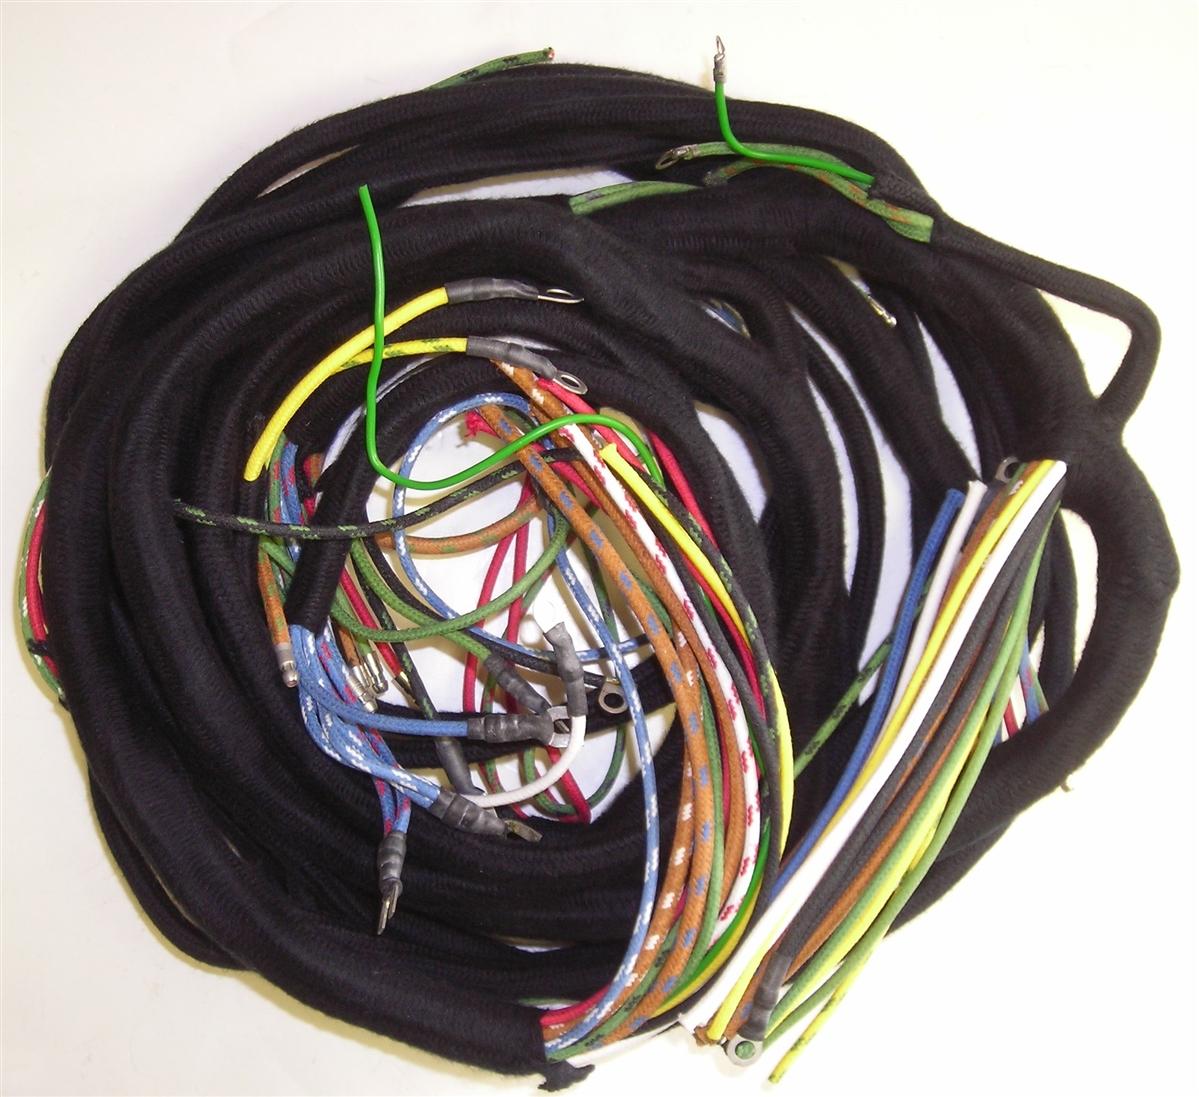 Main Wiring Harness for Triumph TR3 on triumph stag wiring, triumph tr4 wiring, porsche 914 wiring, ford mustang wiring, triumph gt6 alternator wiring, tr6 dashboard wiring, triumph scrambler wiring, triumph tr25 wiring, mg midget wiring, ford pinto wiring, jeep cherokee wiring, dodge dakota wiring, triumph tr6 wiring, triumph spitfire wiring,